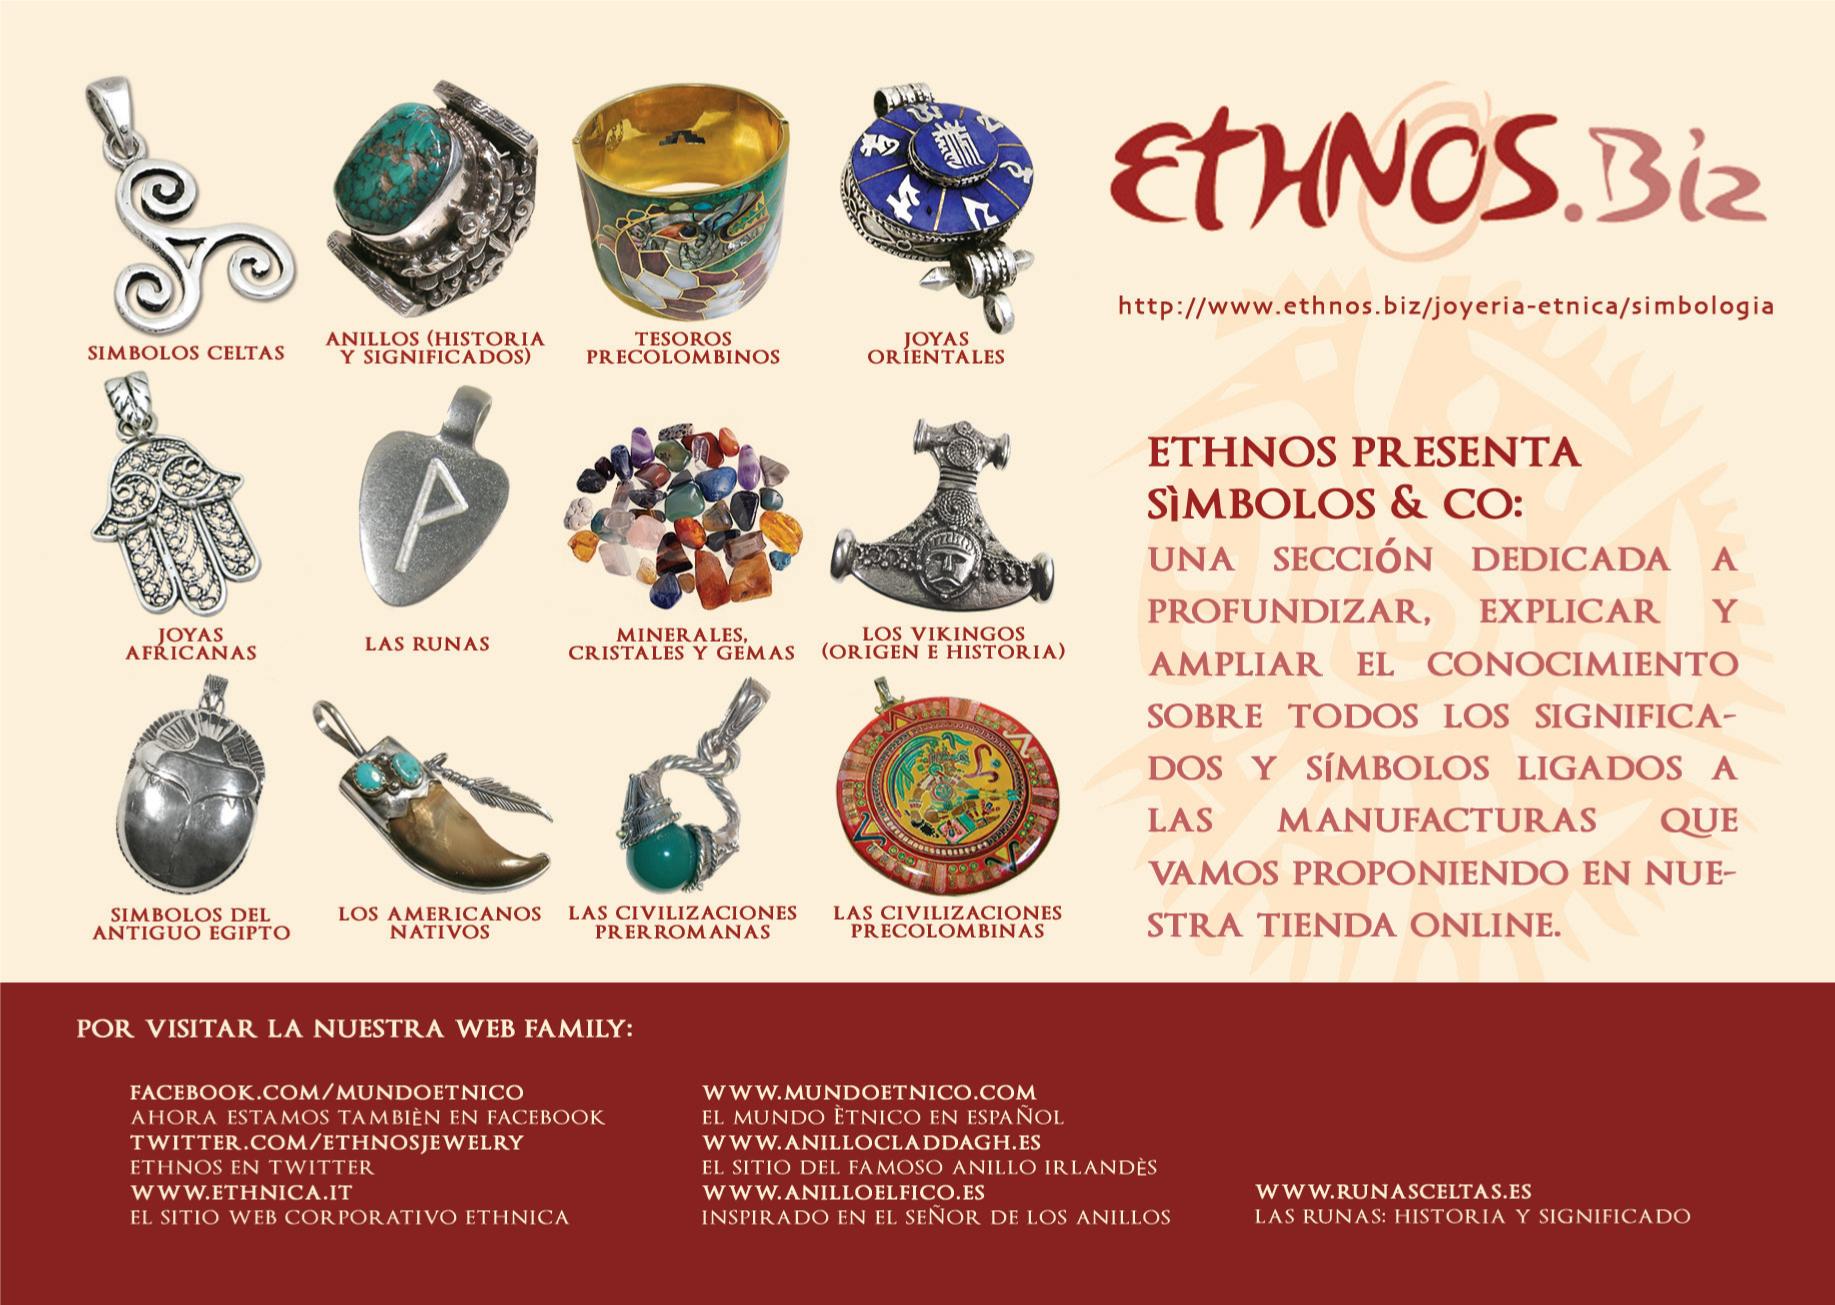 cartolina-ethnos-corretta-DEFINITIVO-ESP-2